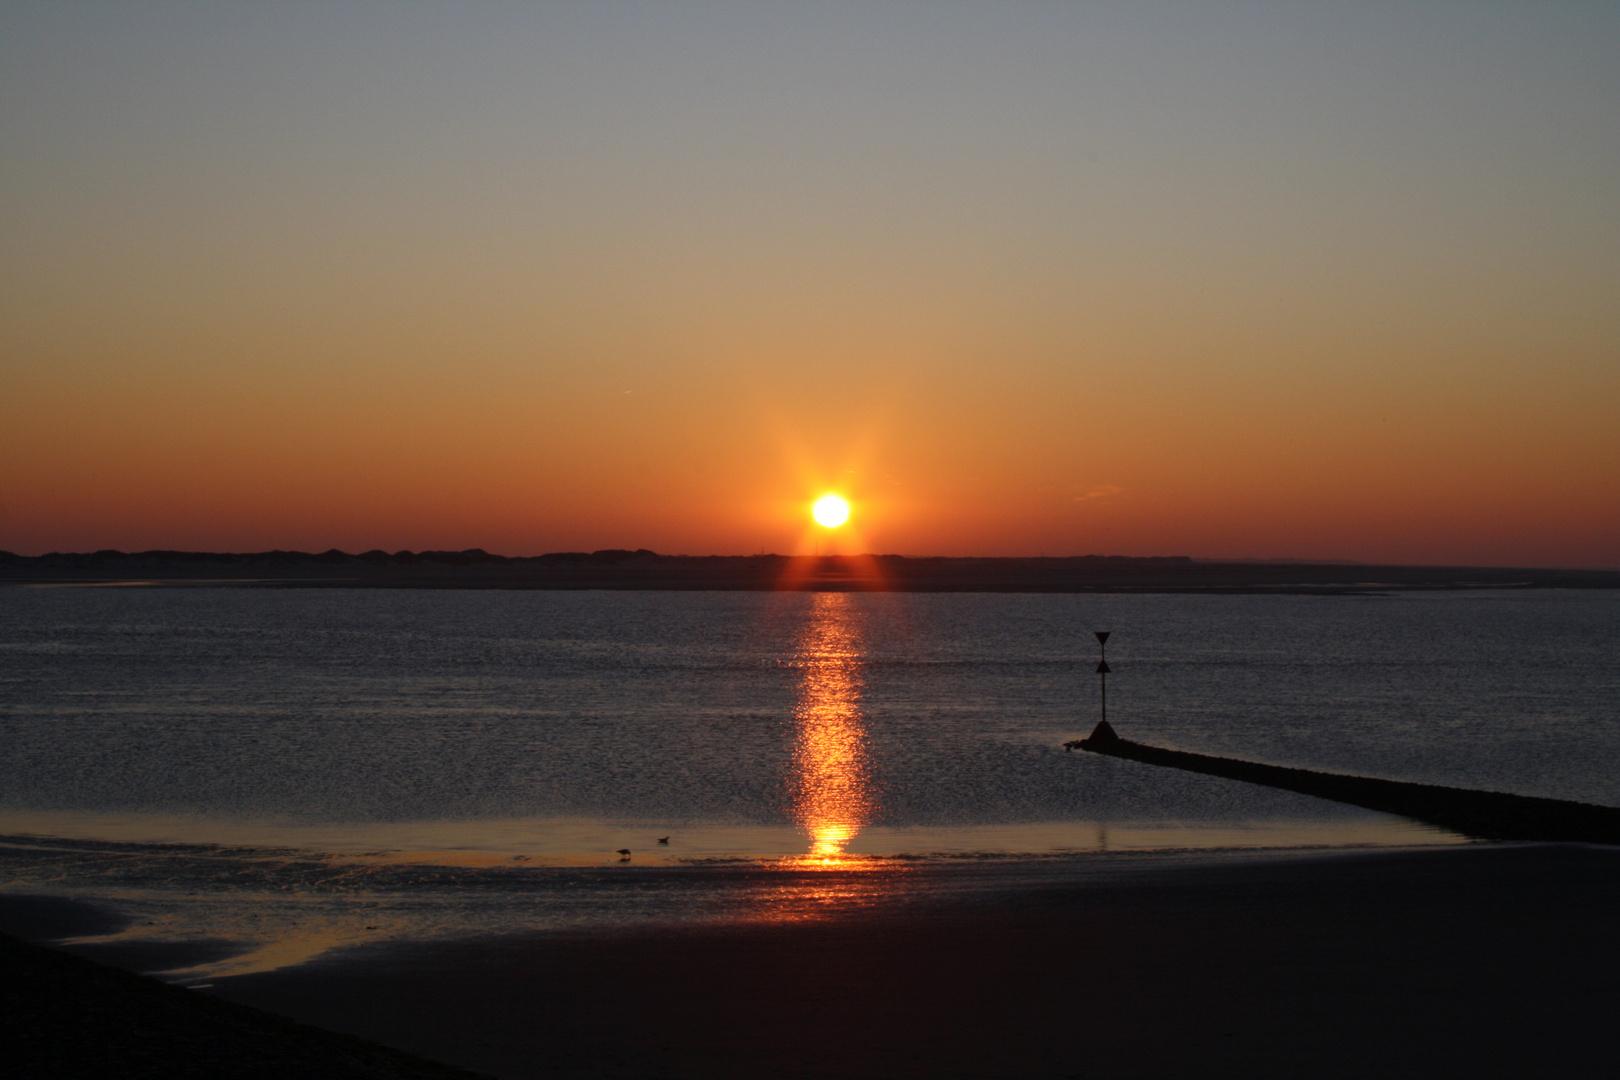 Sonnenuntergang über der Insel Norderney